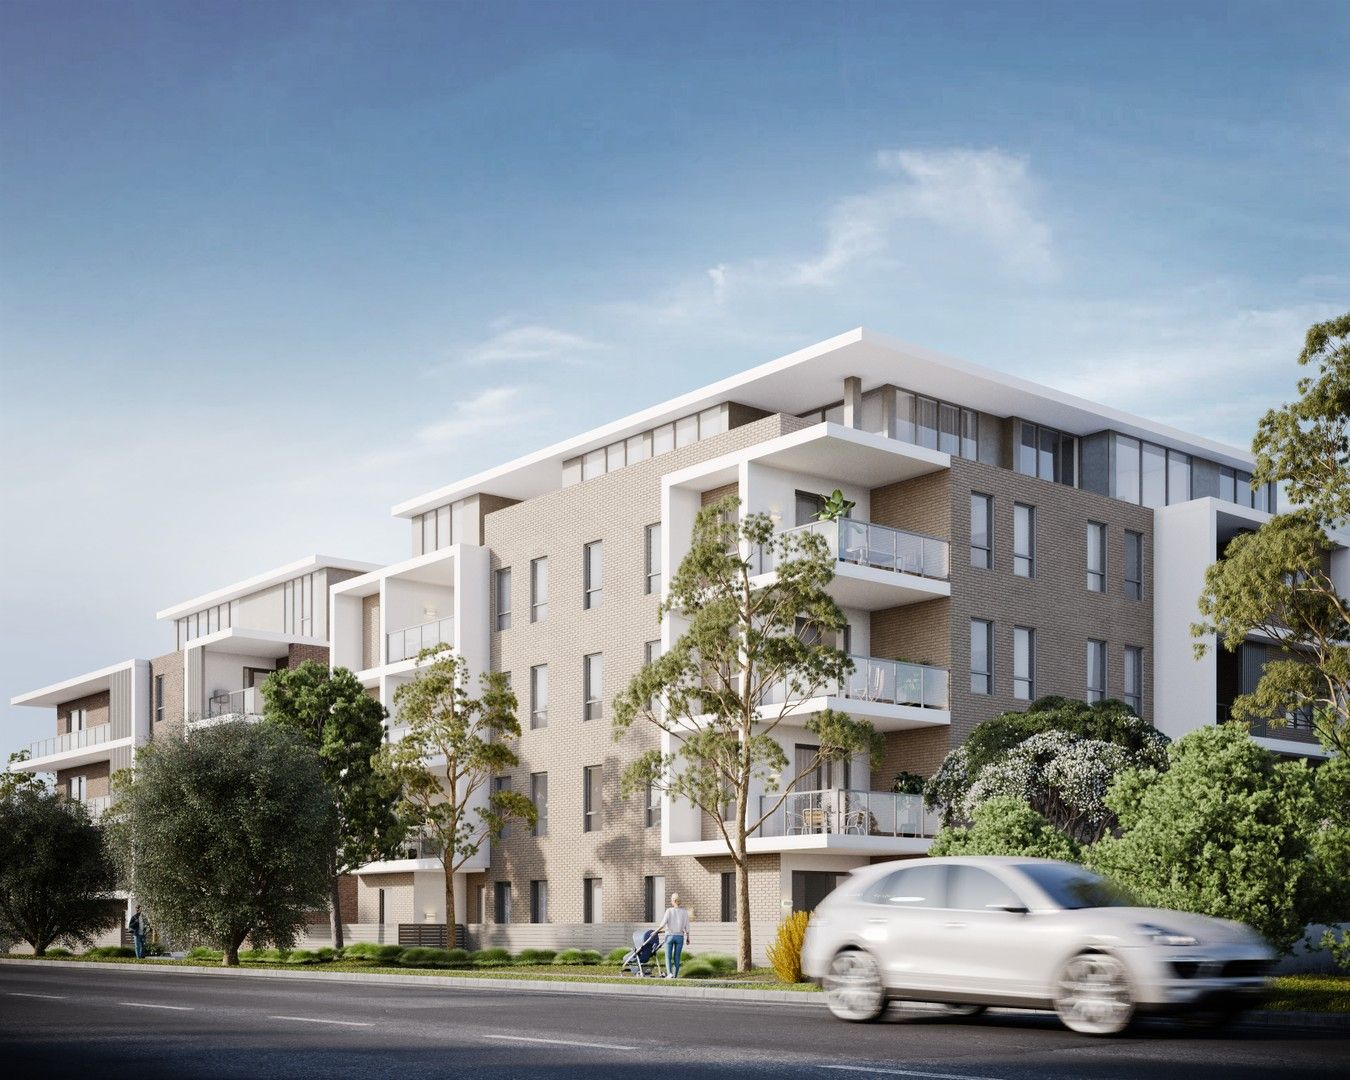 1-7 Markham Avenue, Penrith NSW 2750, Image 0